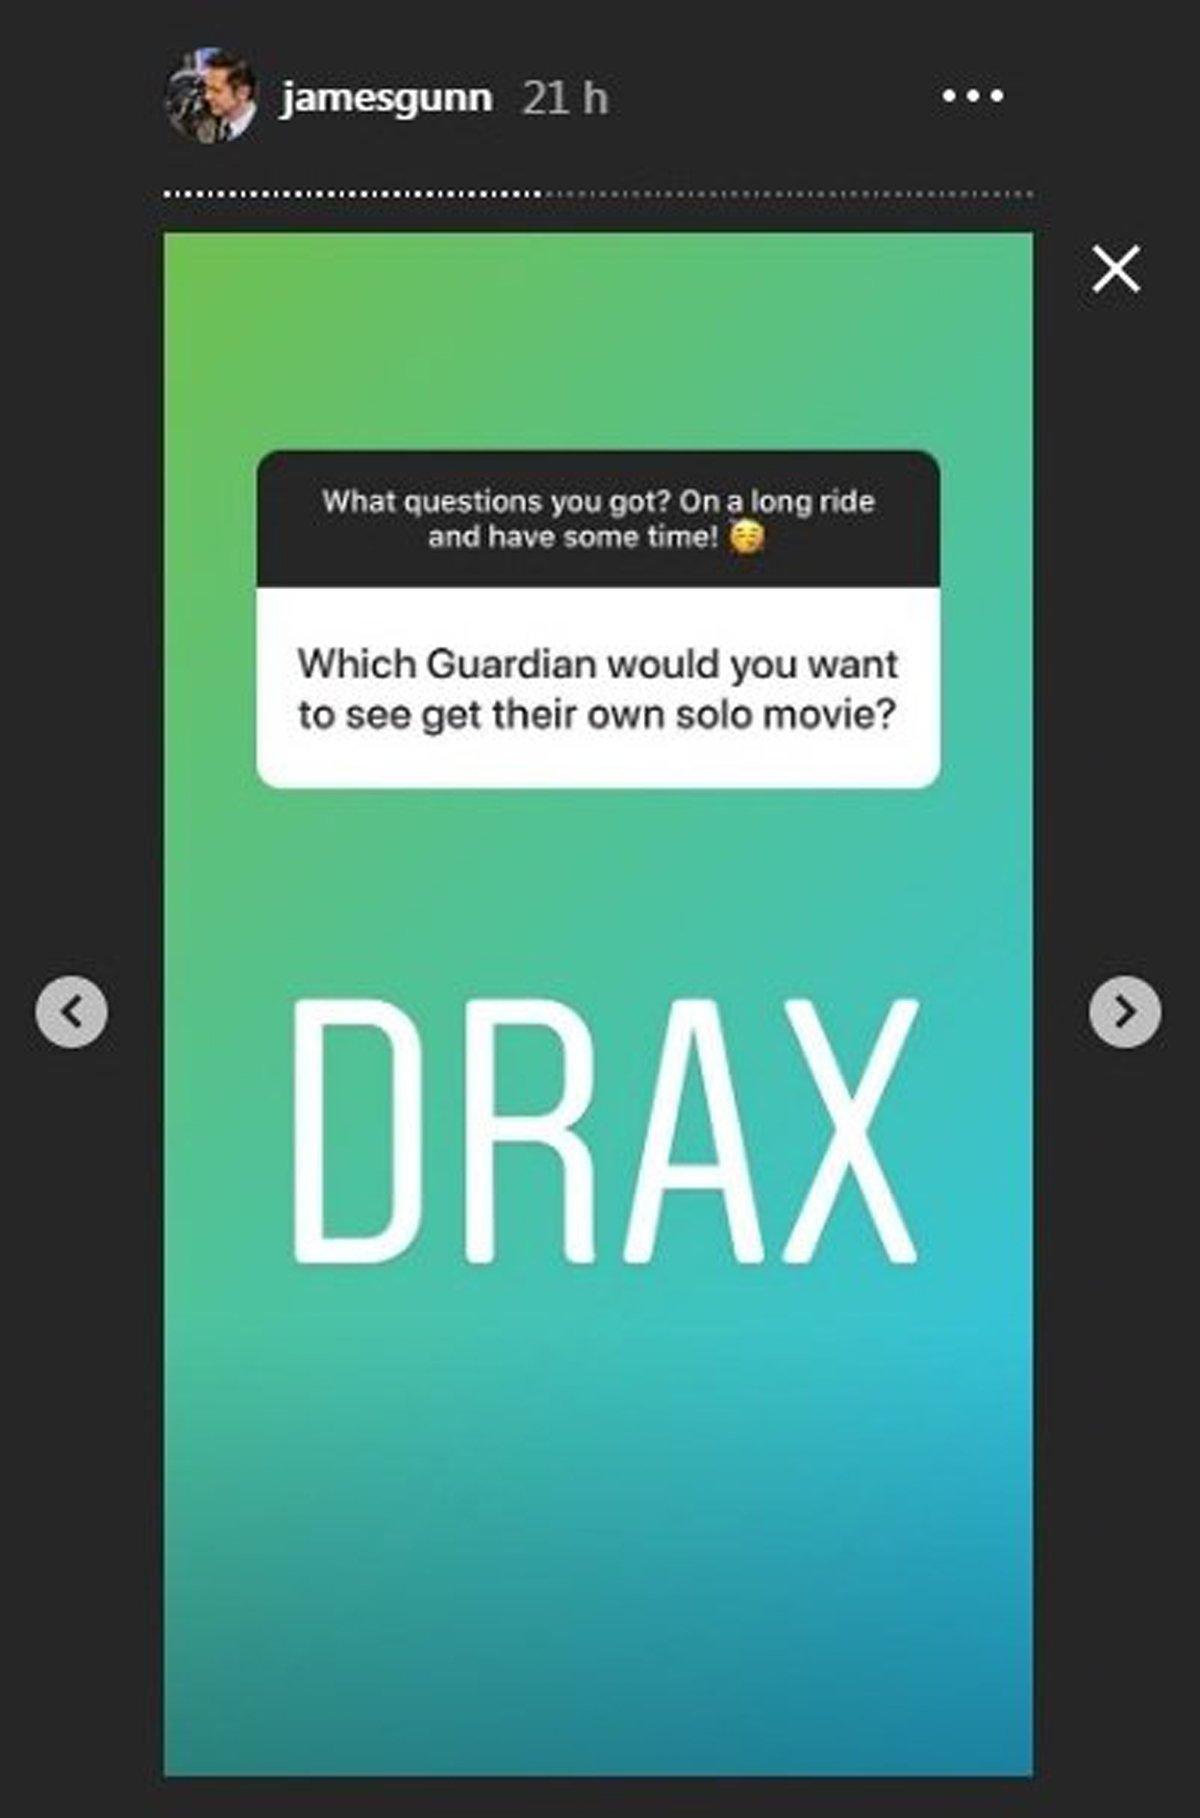 James Gunn Istagram Story Drax Marvel movie